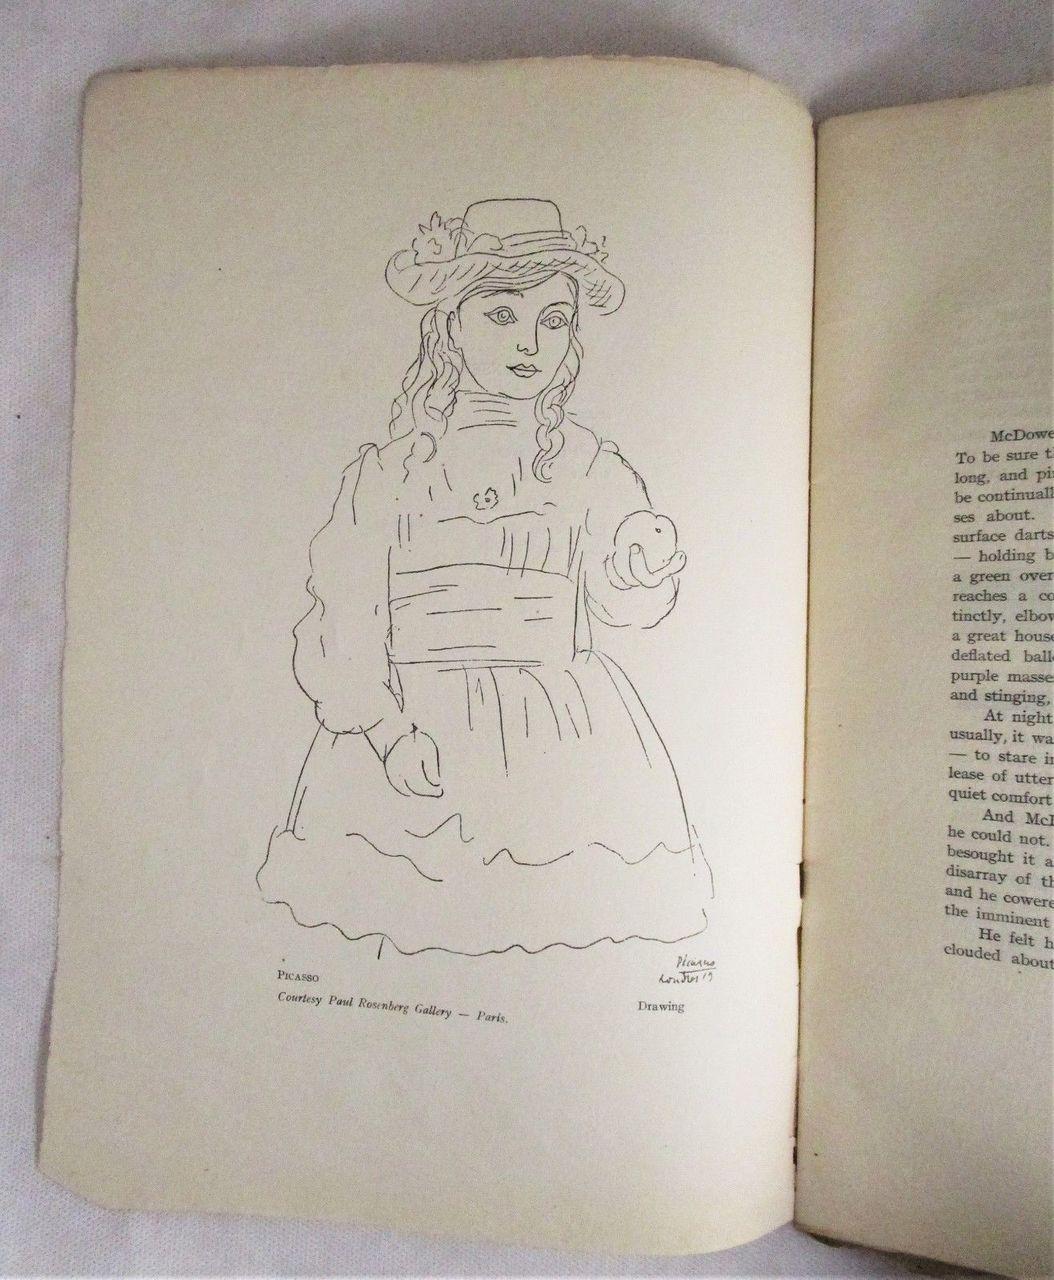 BROOM: INTERNATIONAL MAGAZINE OF THE ARTS - July 1922, Vol 2 #4